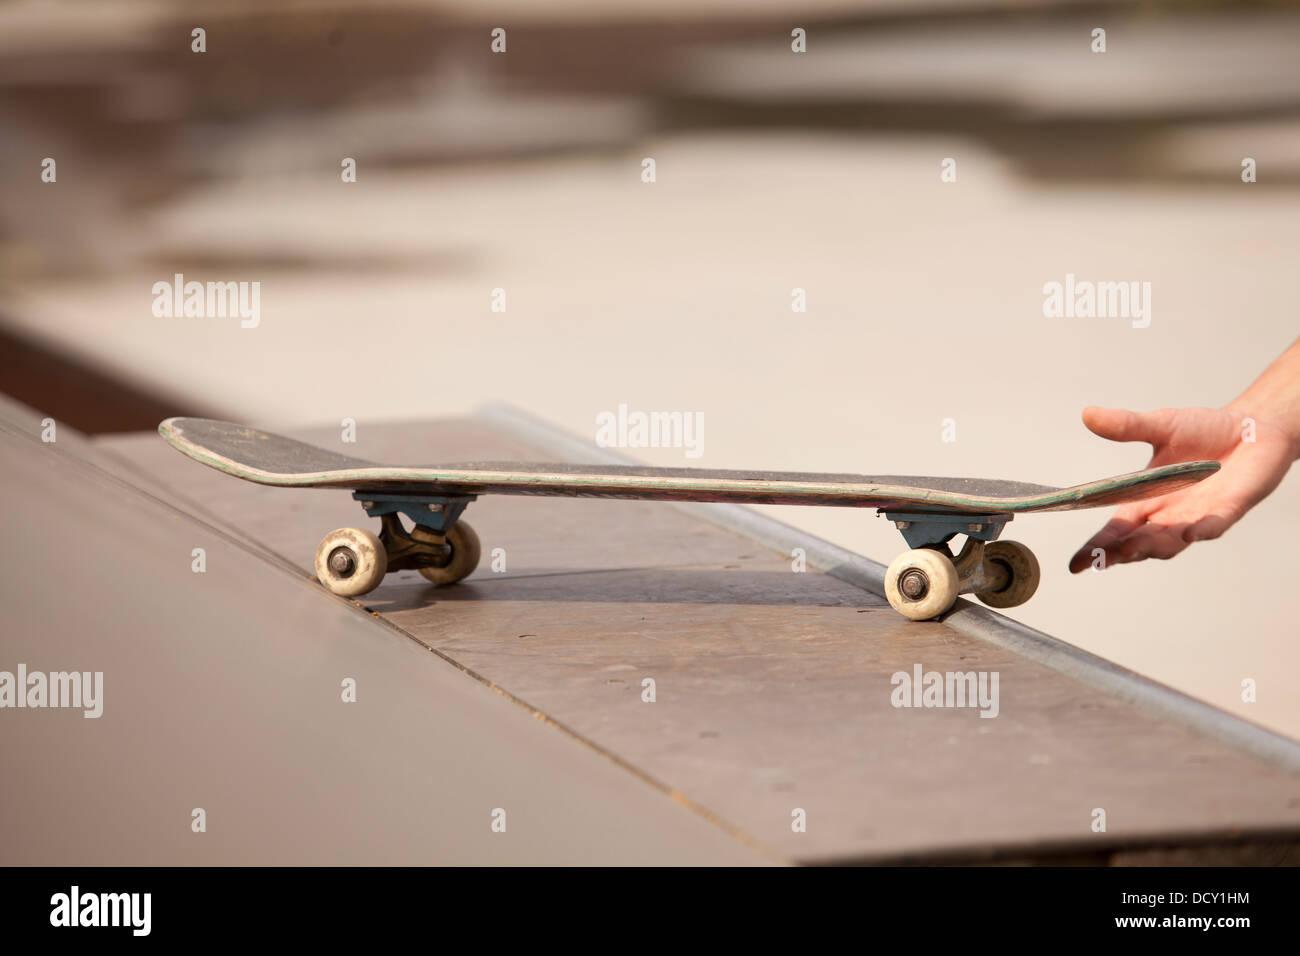 Extrime Stockfotos & Extrime Bilder - Alamy